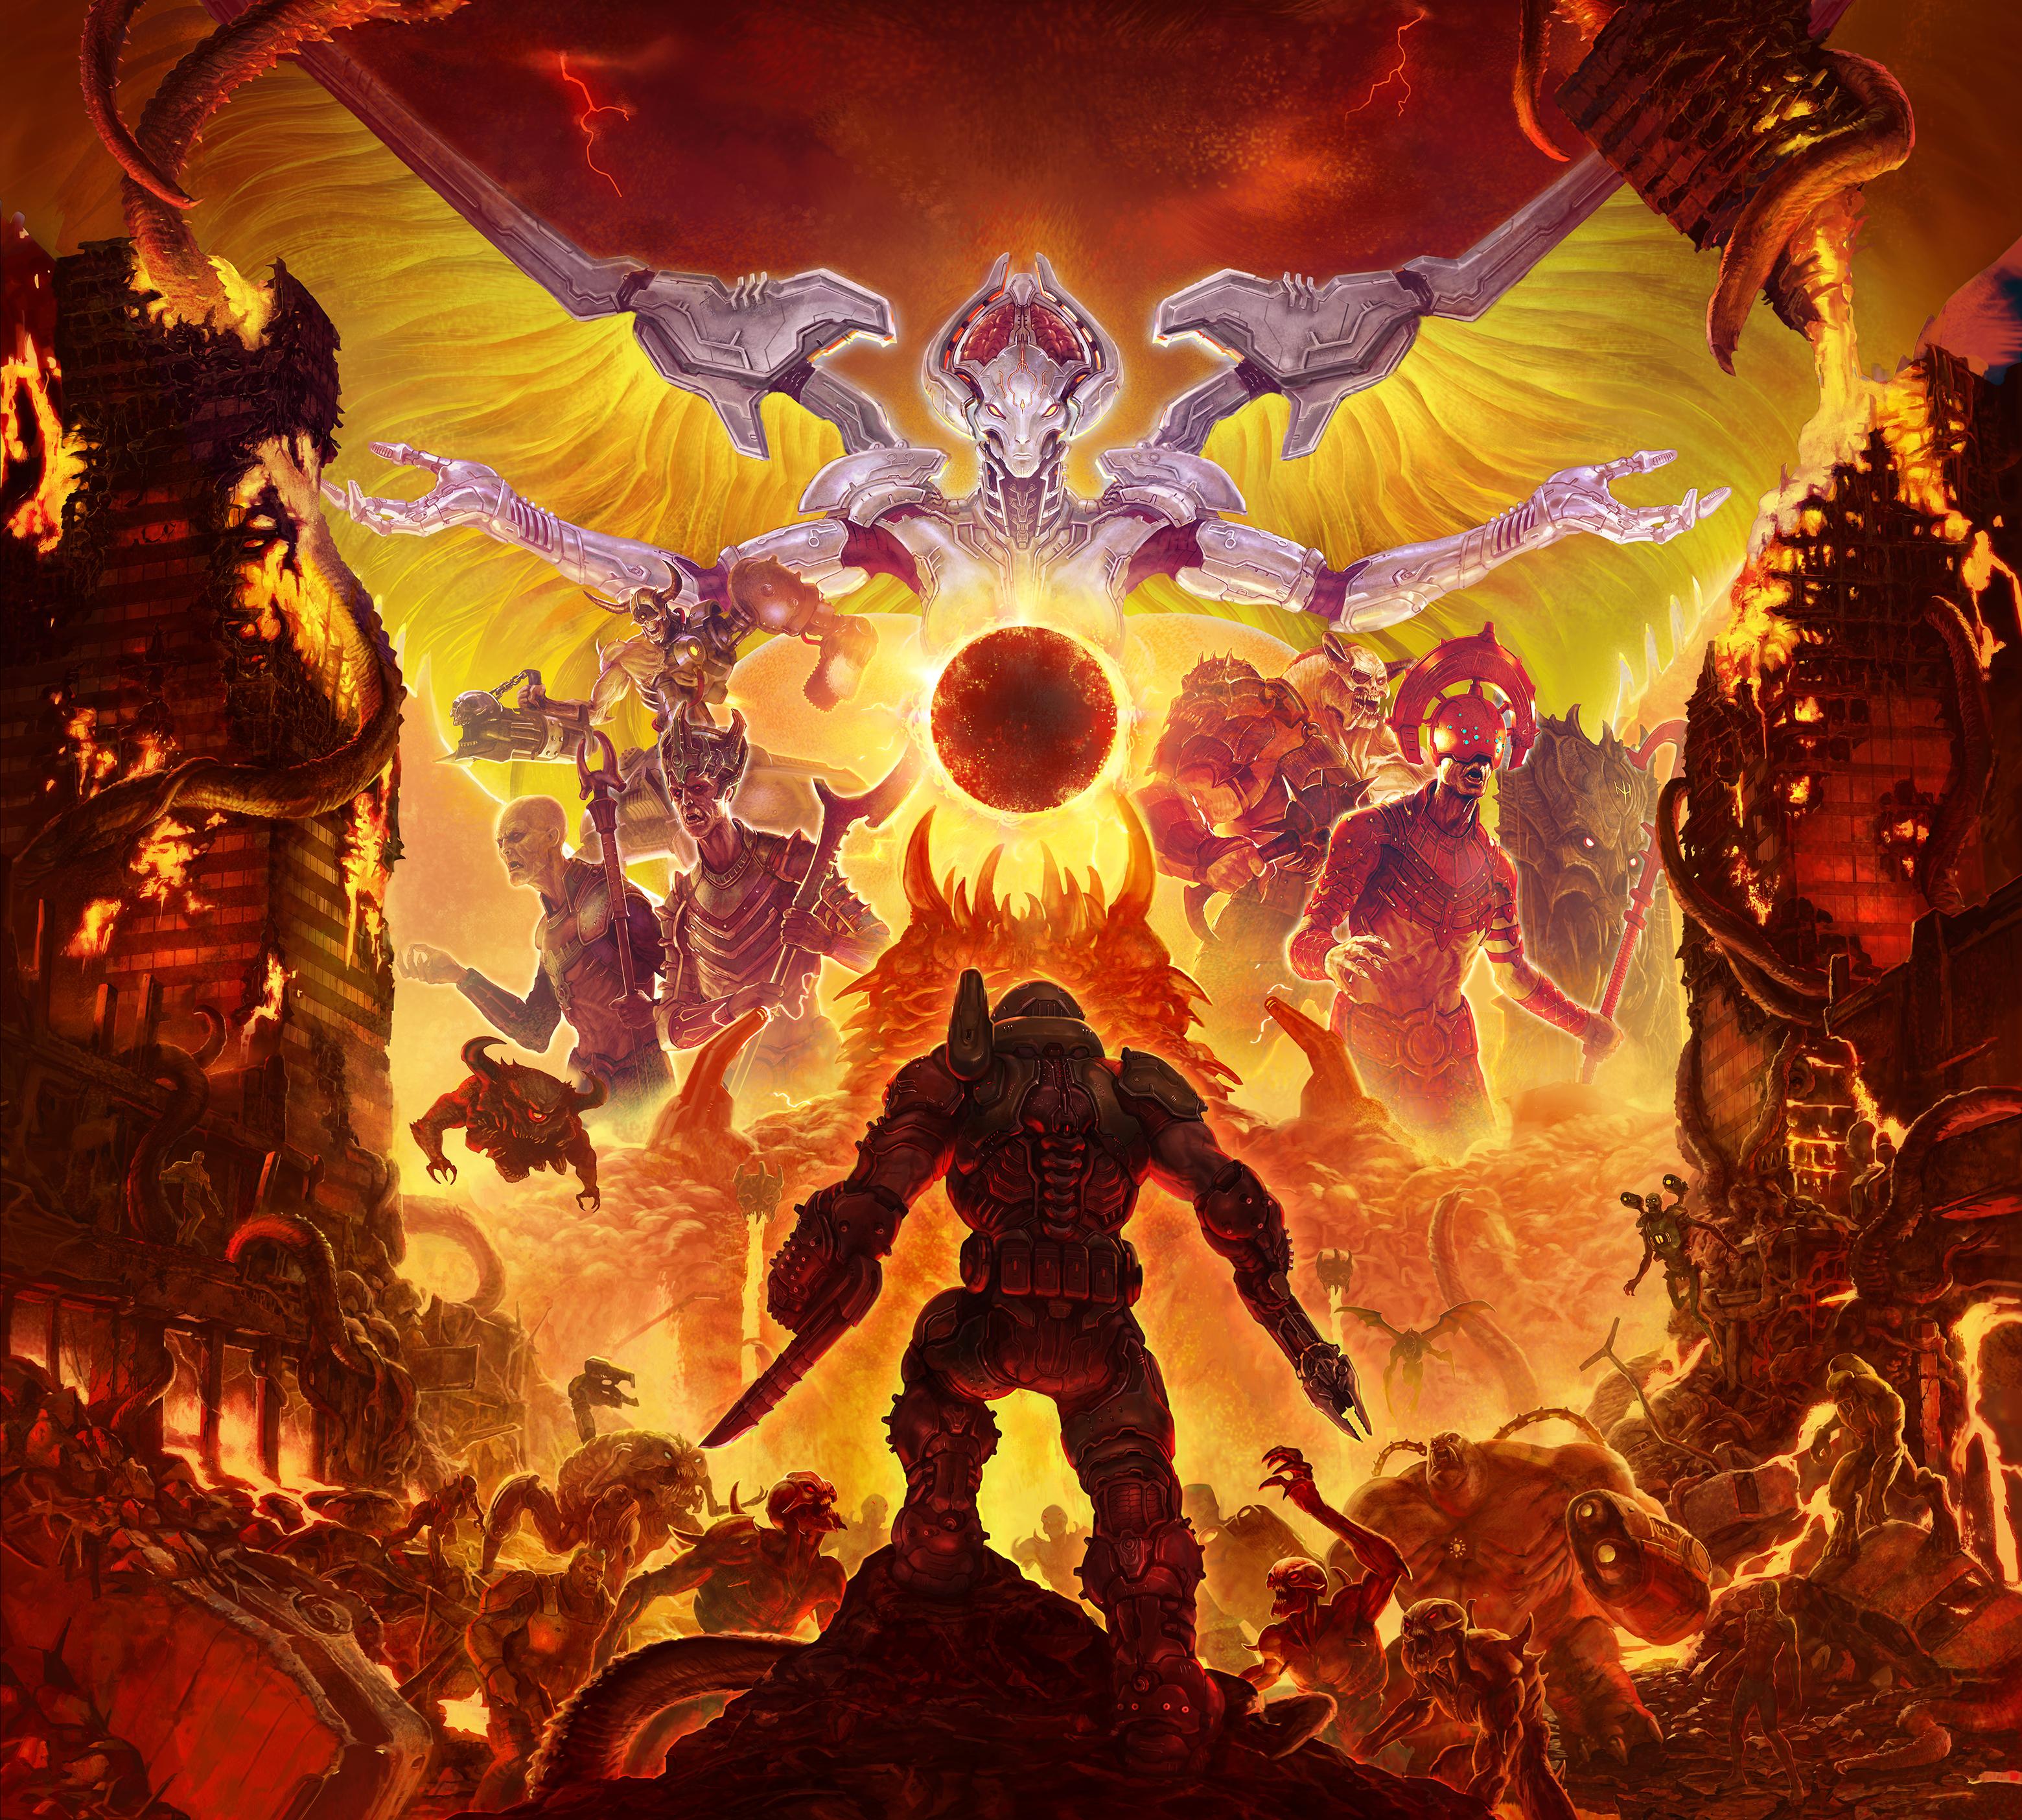 Doom Eternal 2019, HD Games, 4k Wallpapers, Images